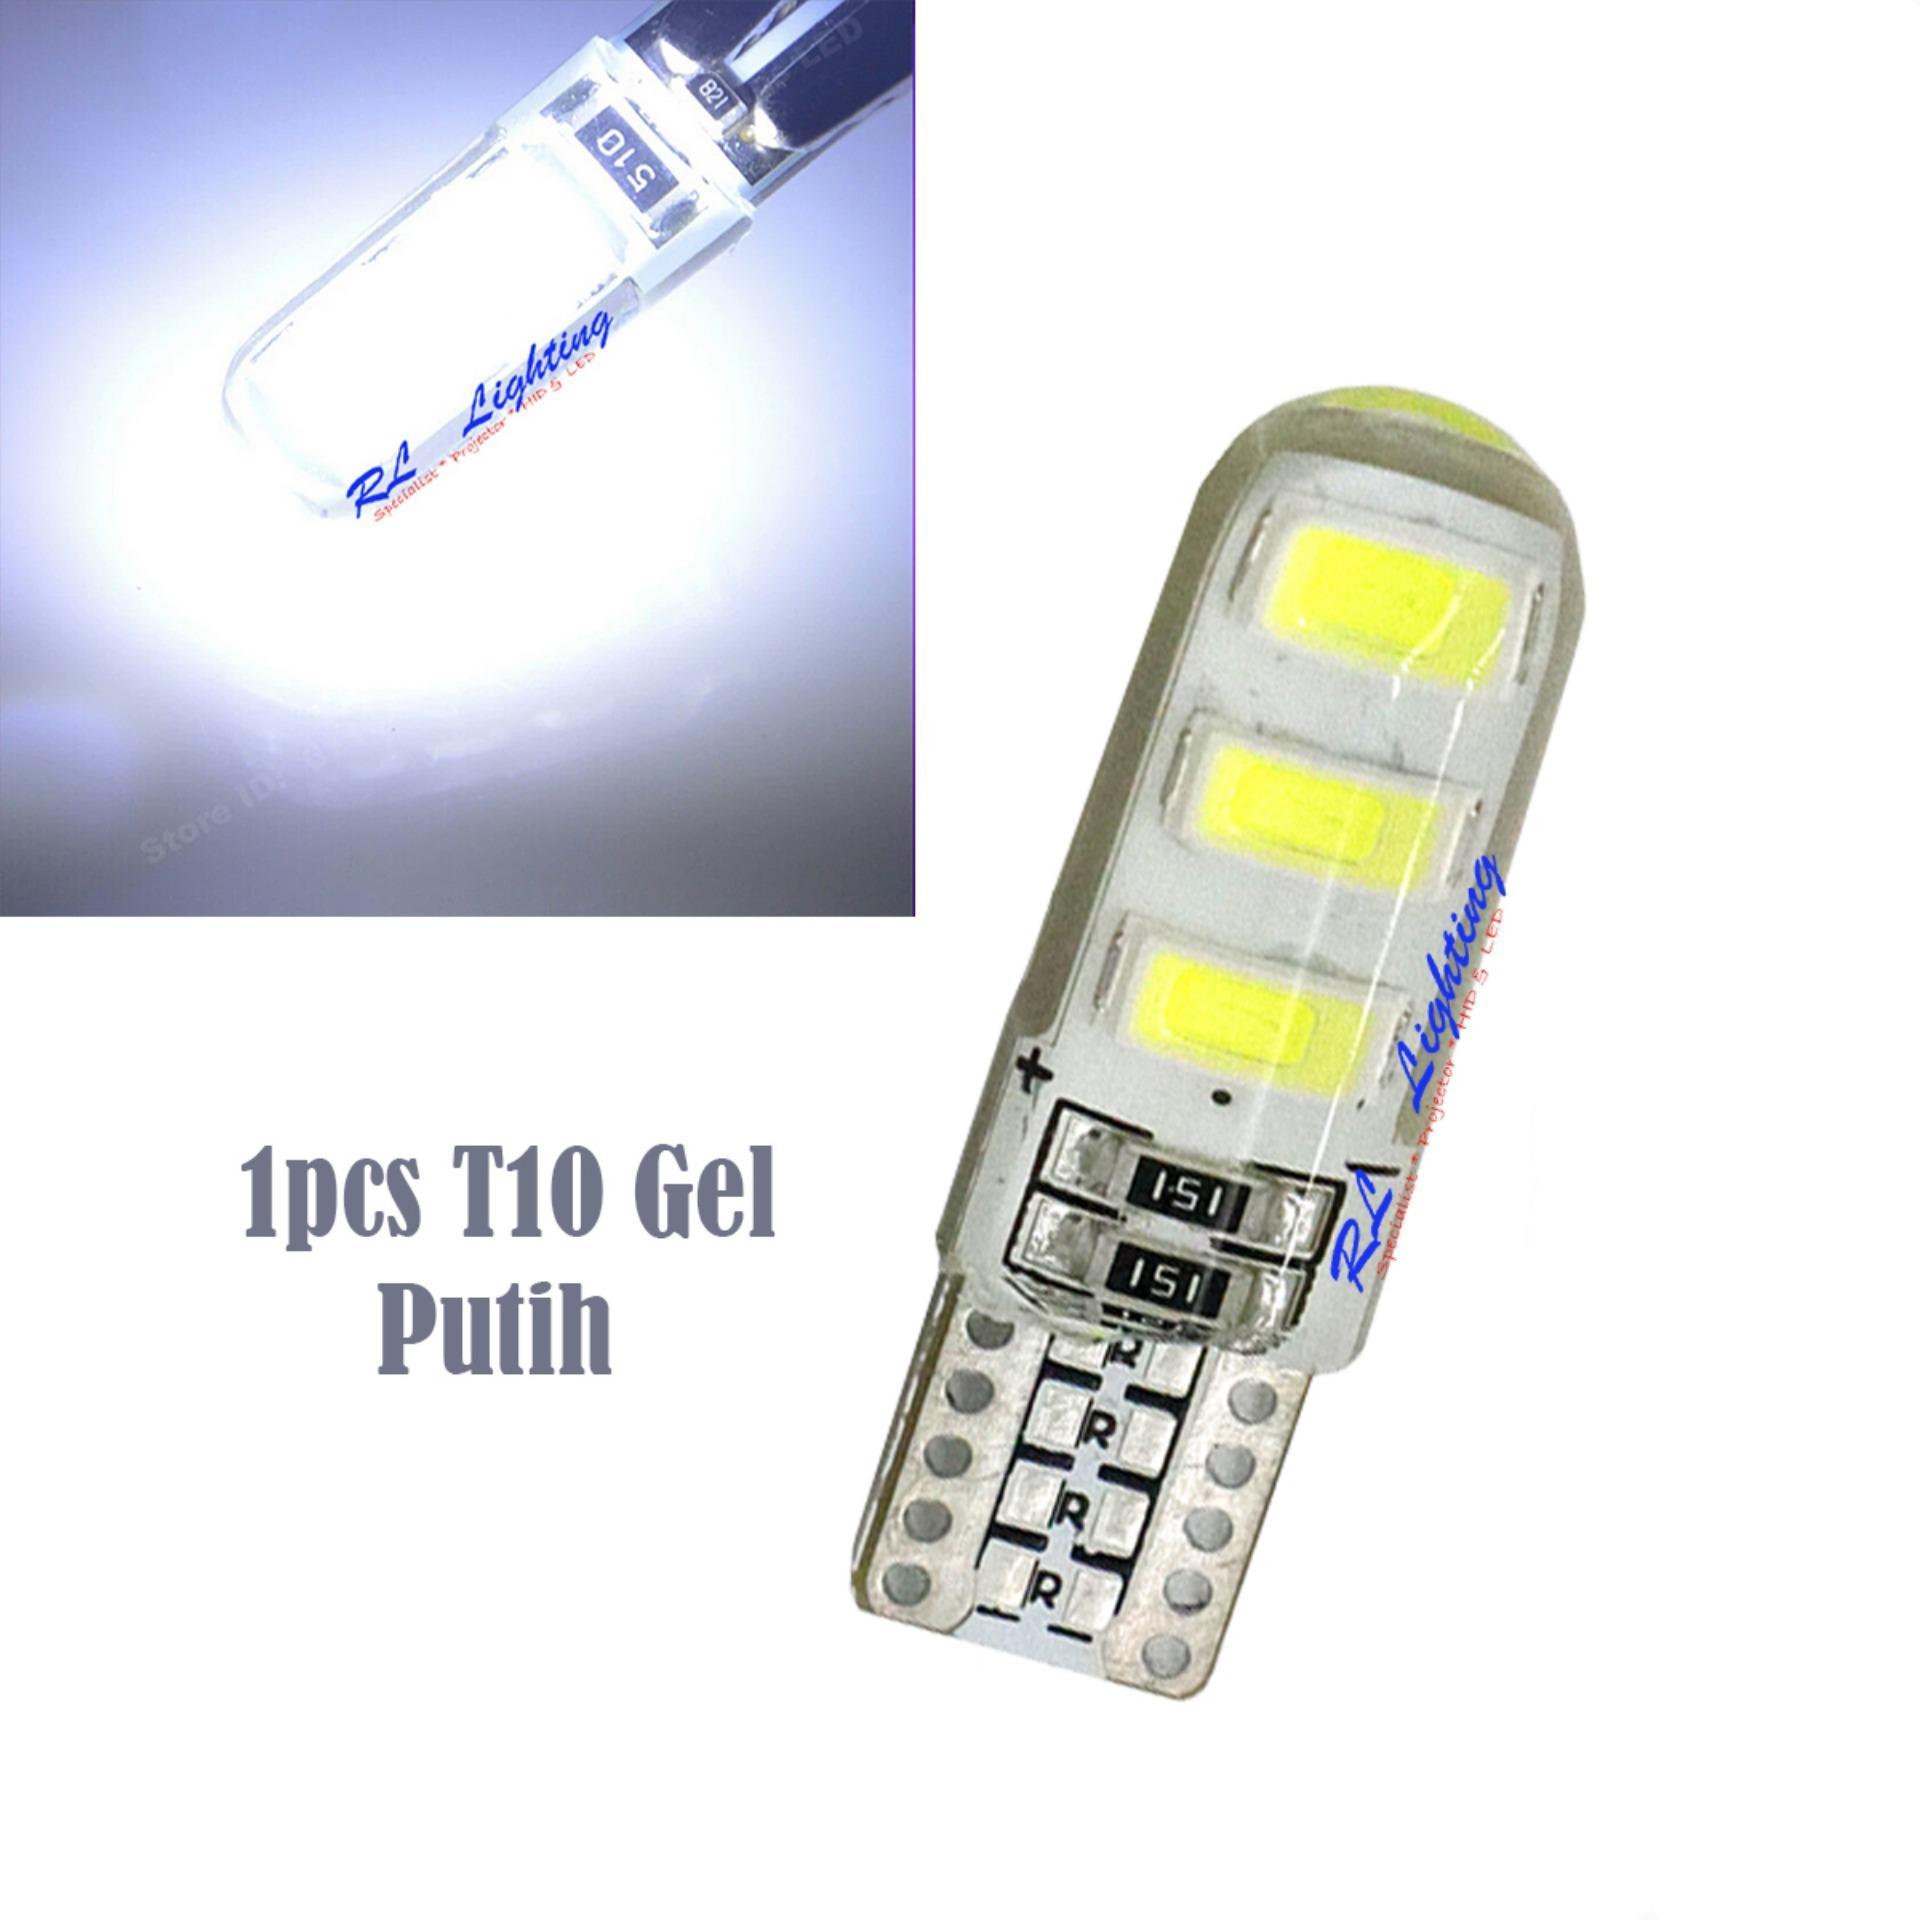 1bh Led T10 Senja 6Led Gel / Jelly / Silicone Super Bright - Putih - 2 ...